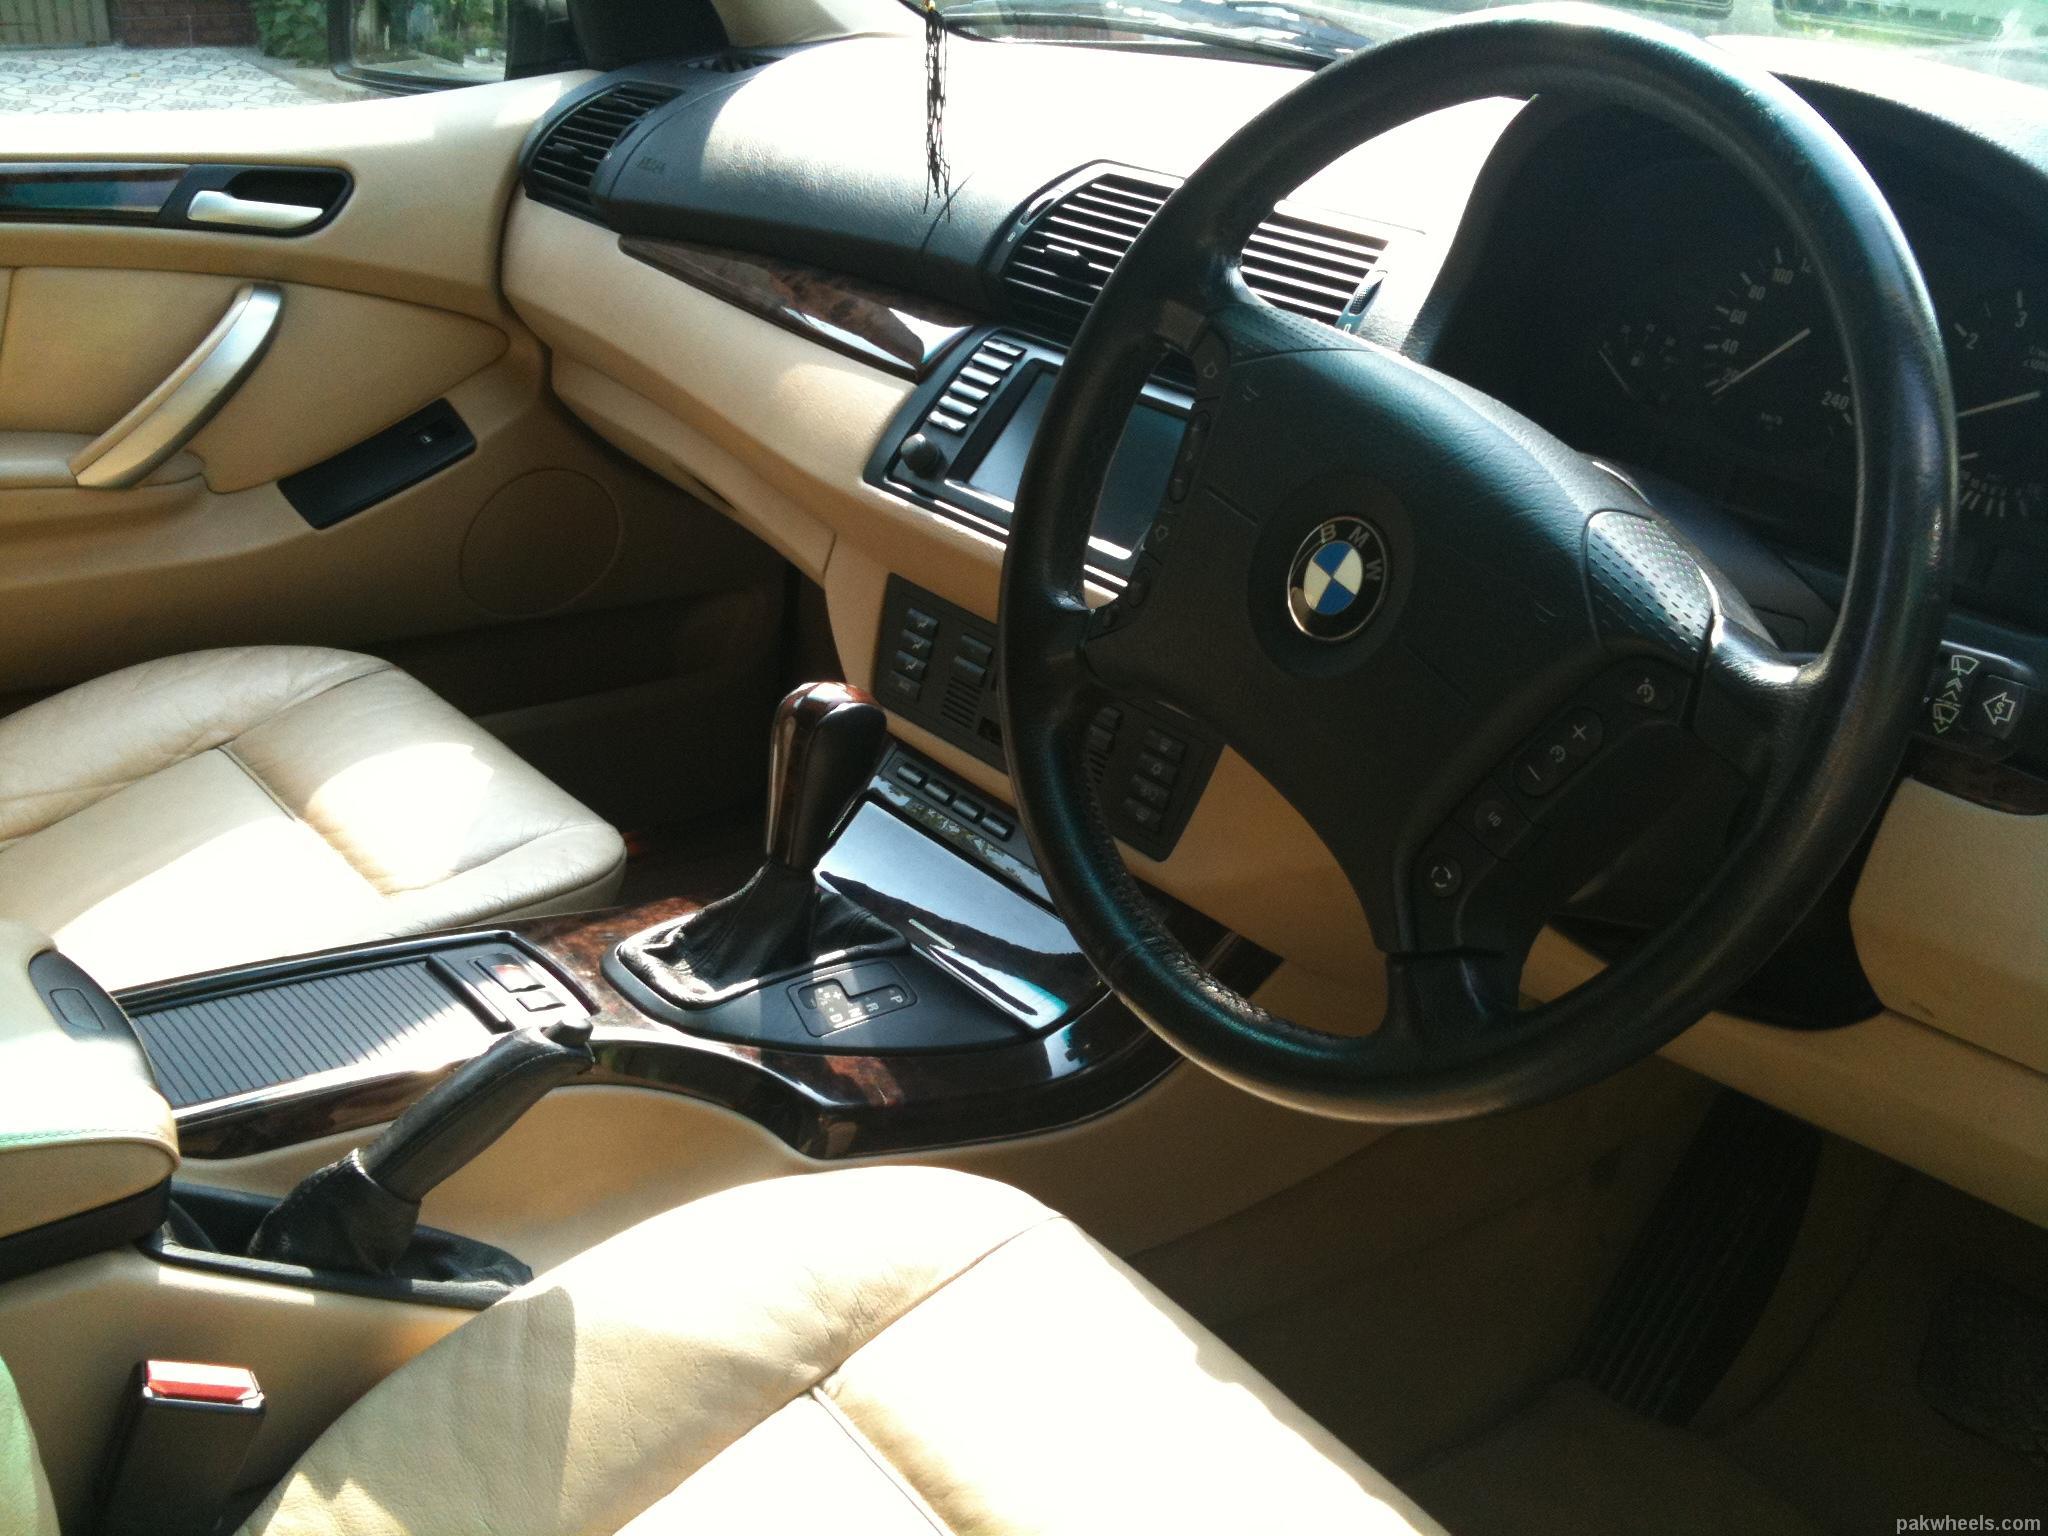 BMW X5 Series - 2001 Black Beauty Image-1